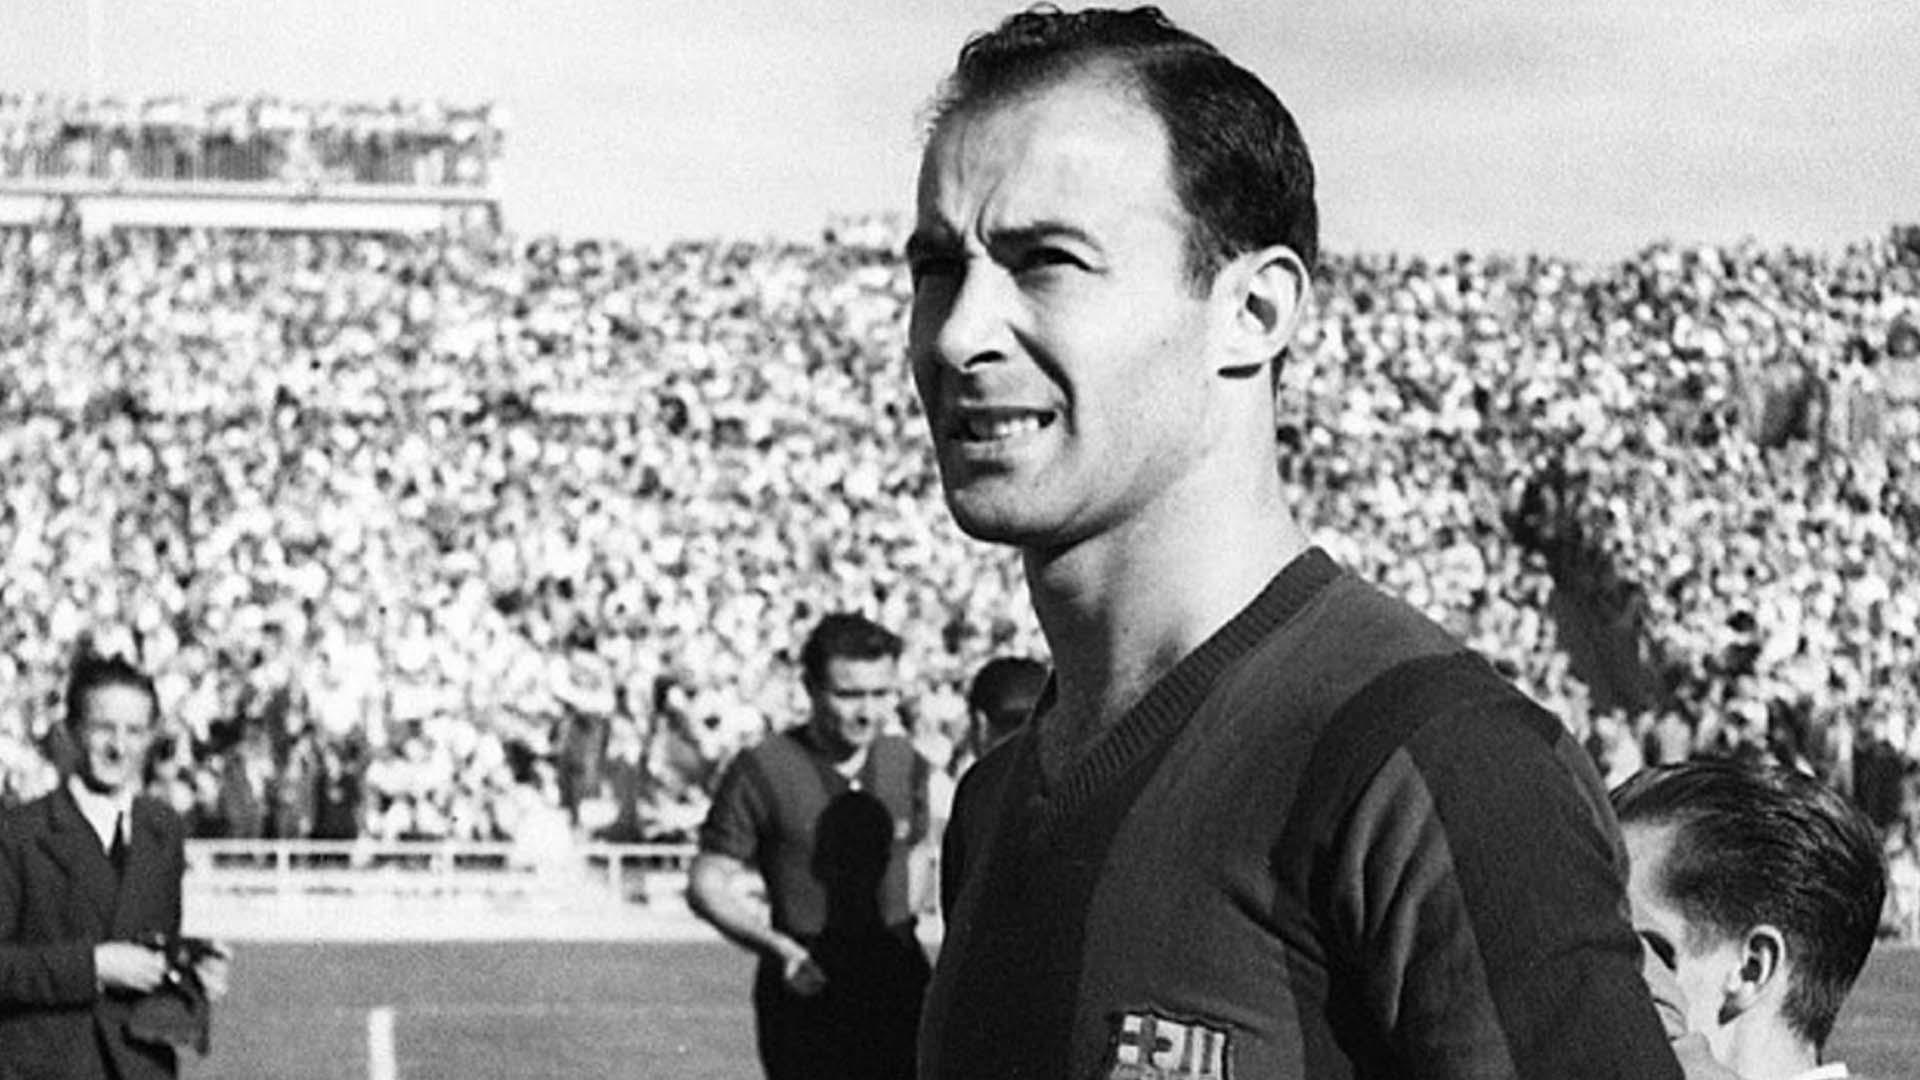 César Rodríguez barcelona